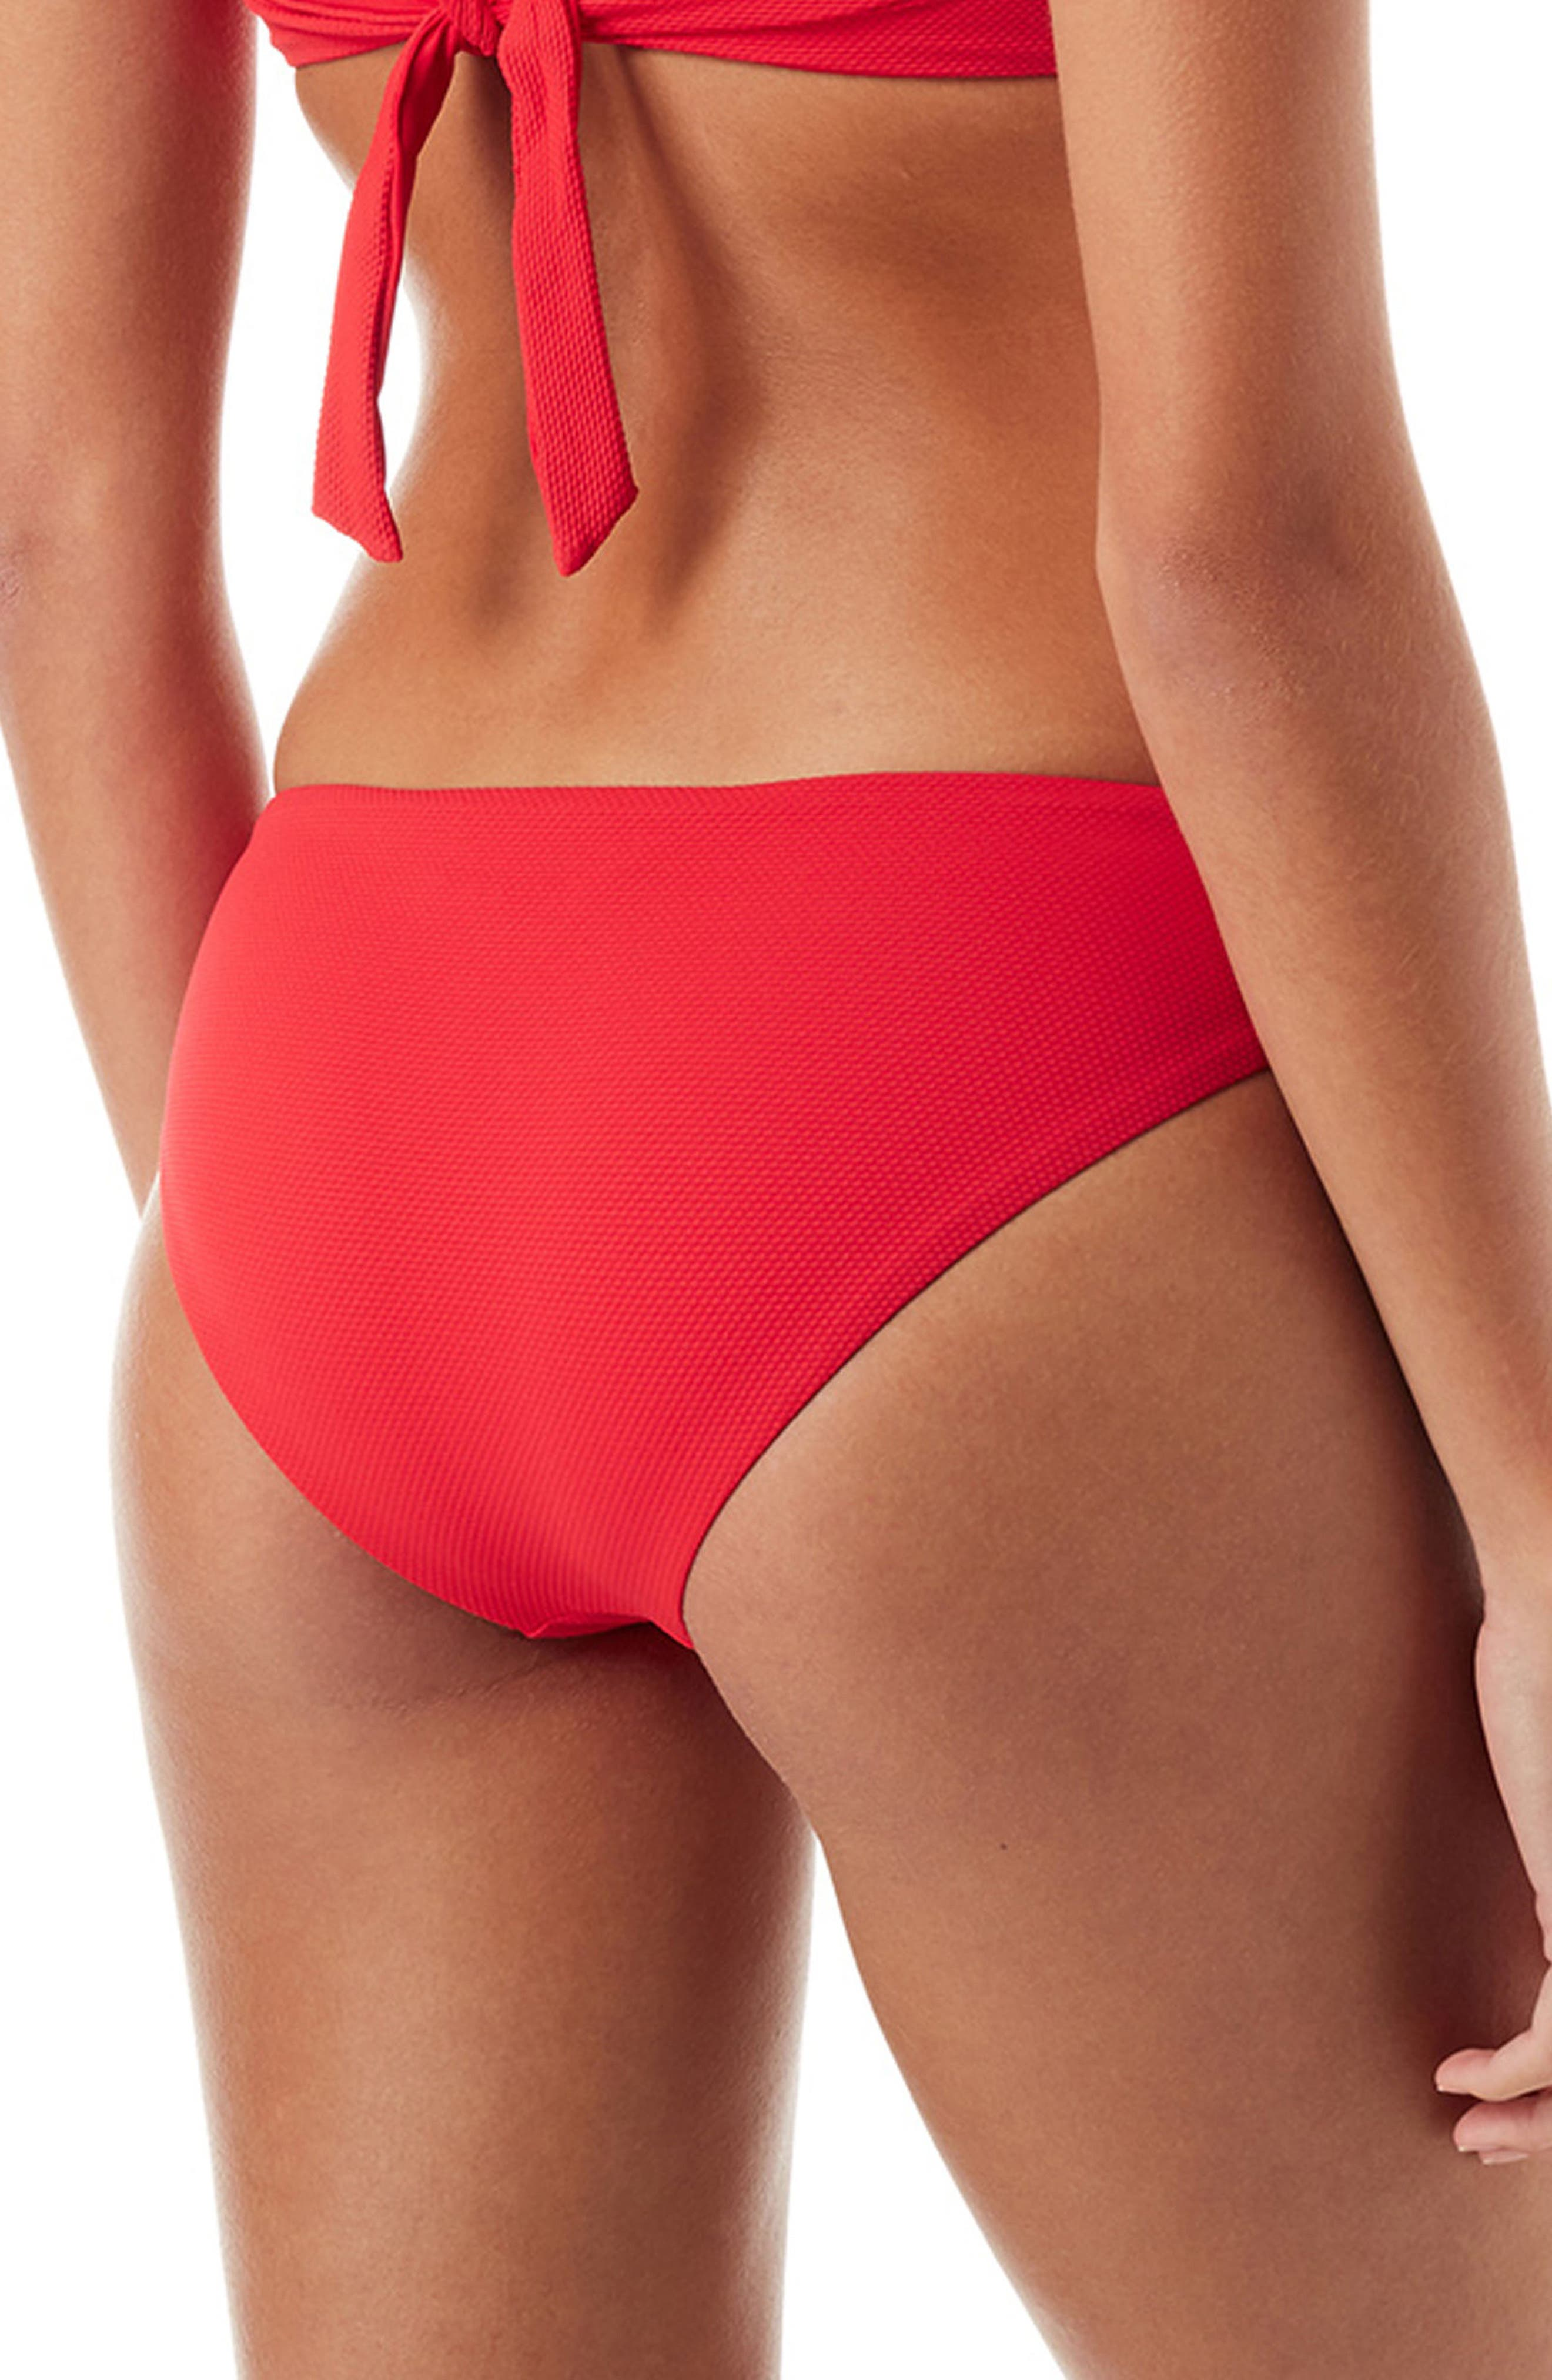 Angola Bikini Bottoms,                             Alternate thumbnail 2, color,                             Pique Red